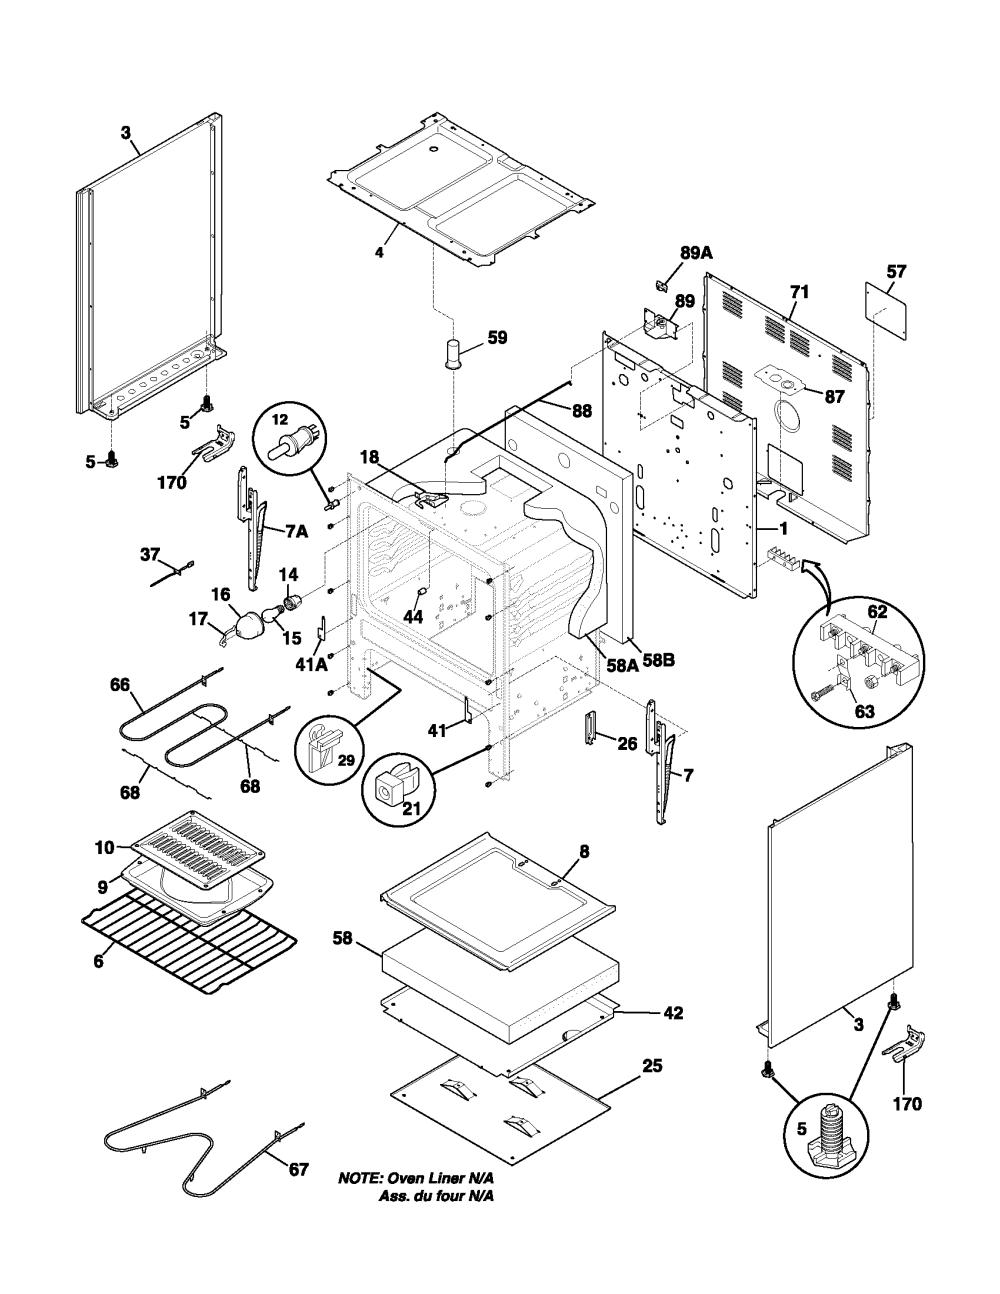 medium resolution of fef352asf electric range body parts diagram